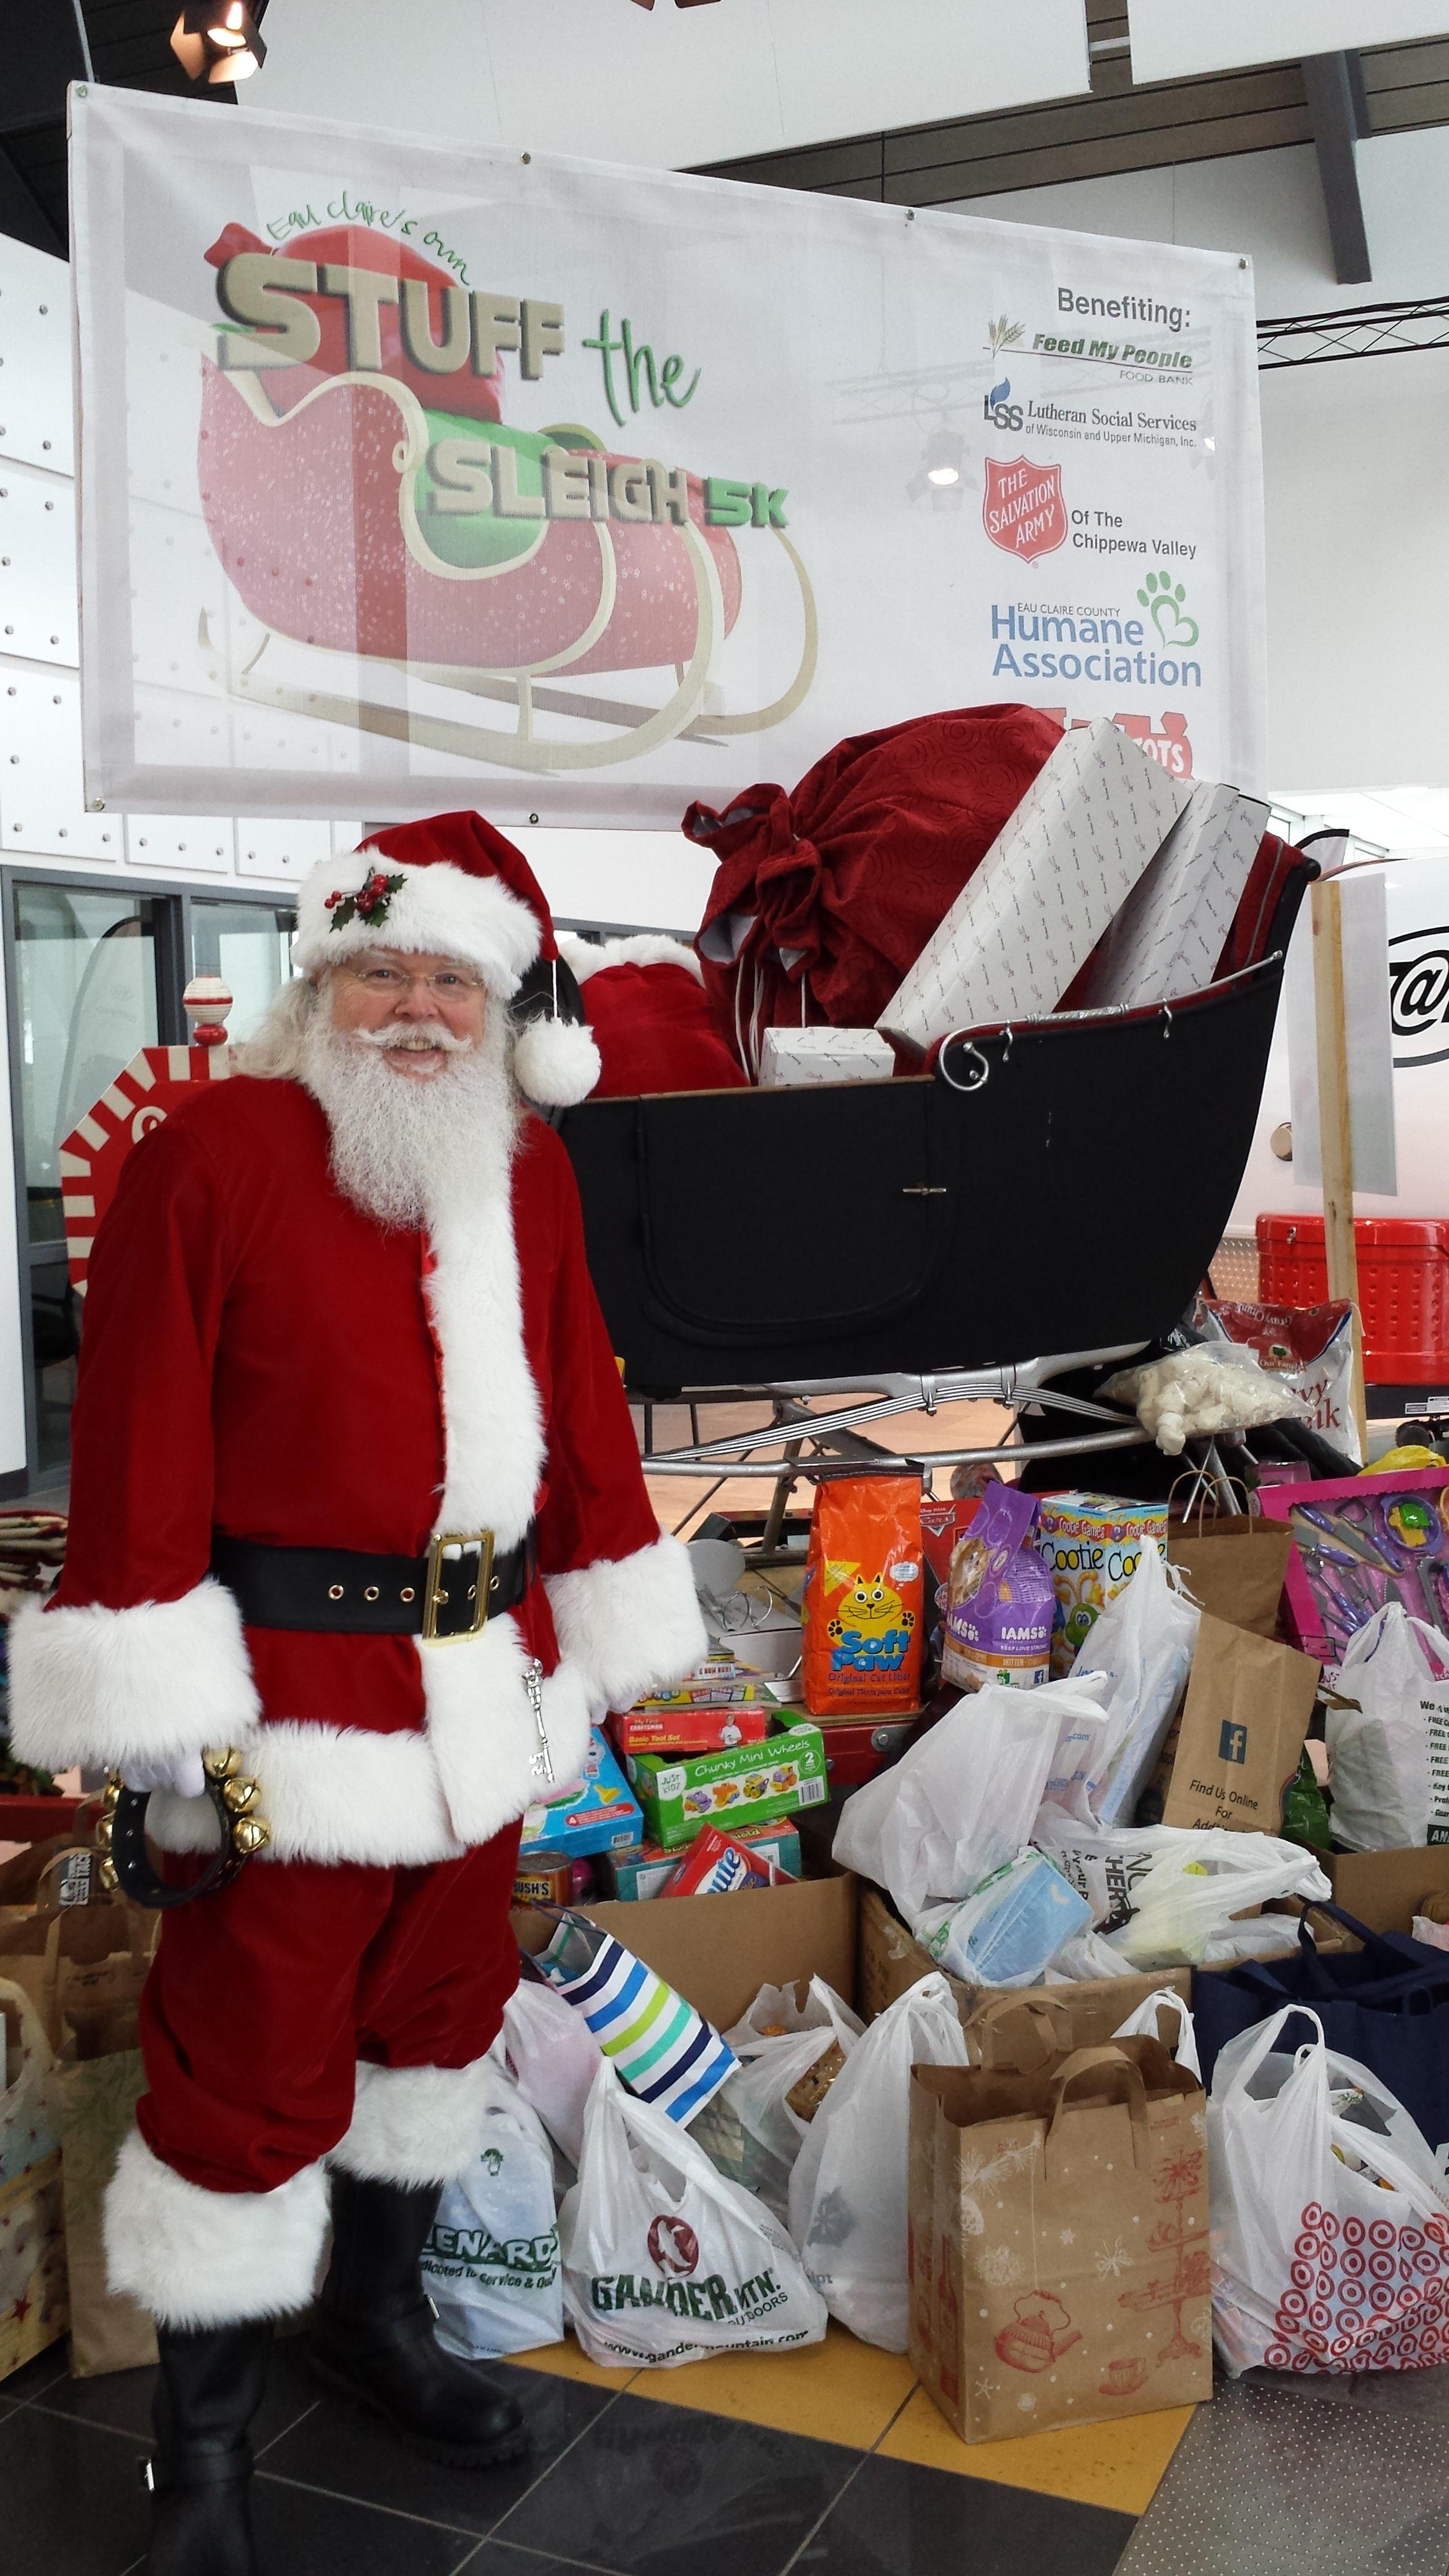 Santa at Stuff the Sleigh 5k